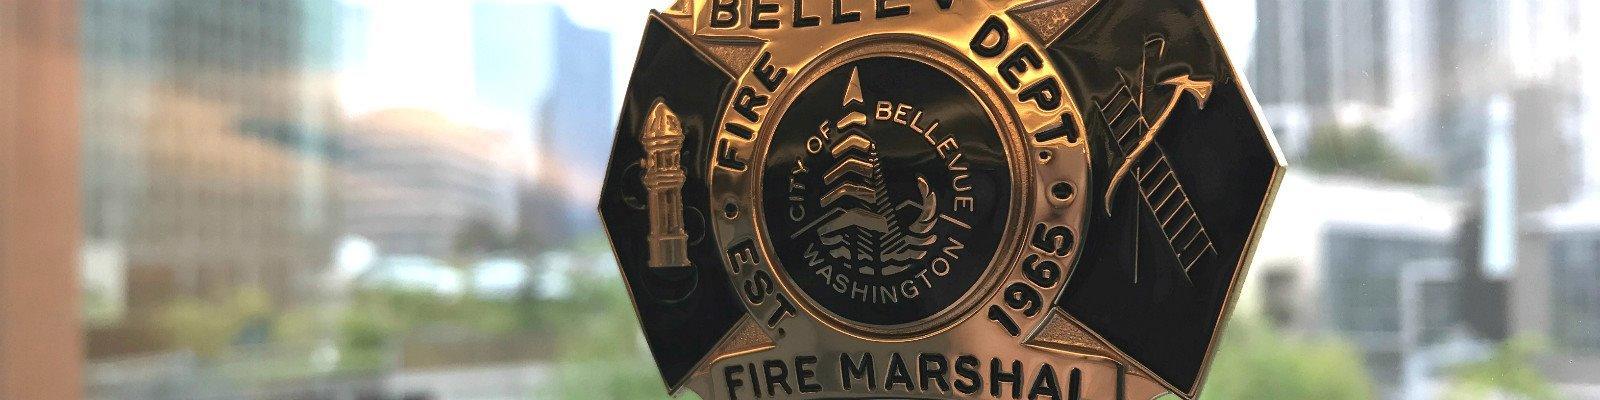 Public Information Sheets | City of Bellevue